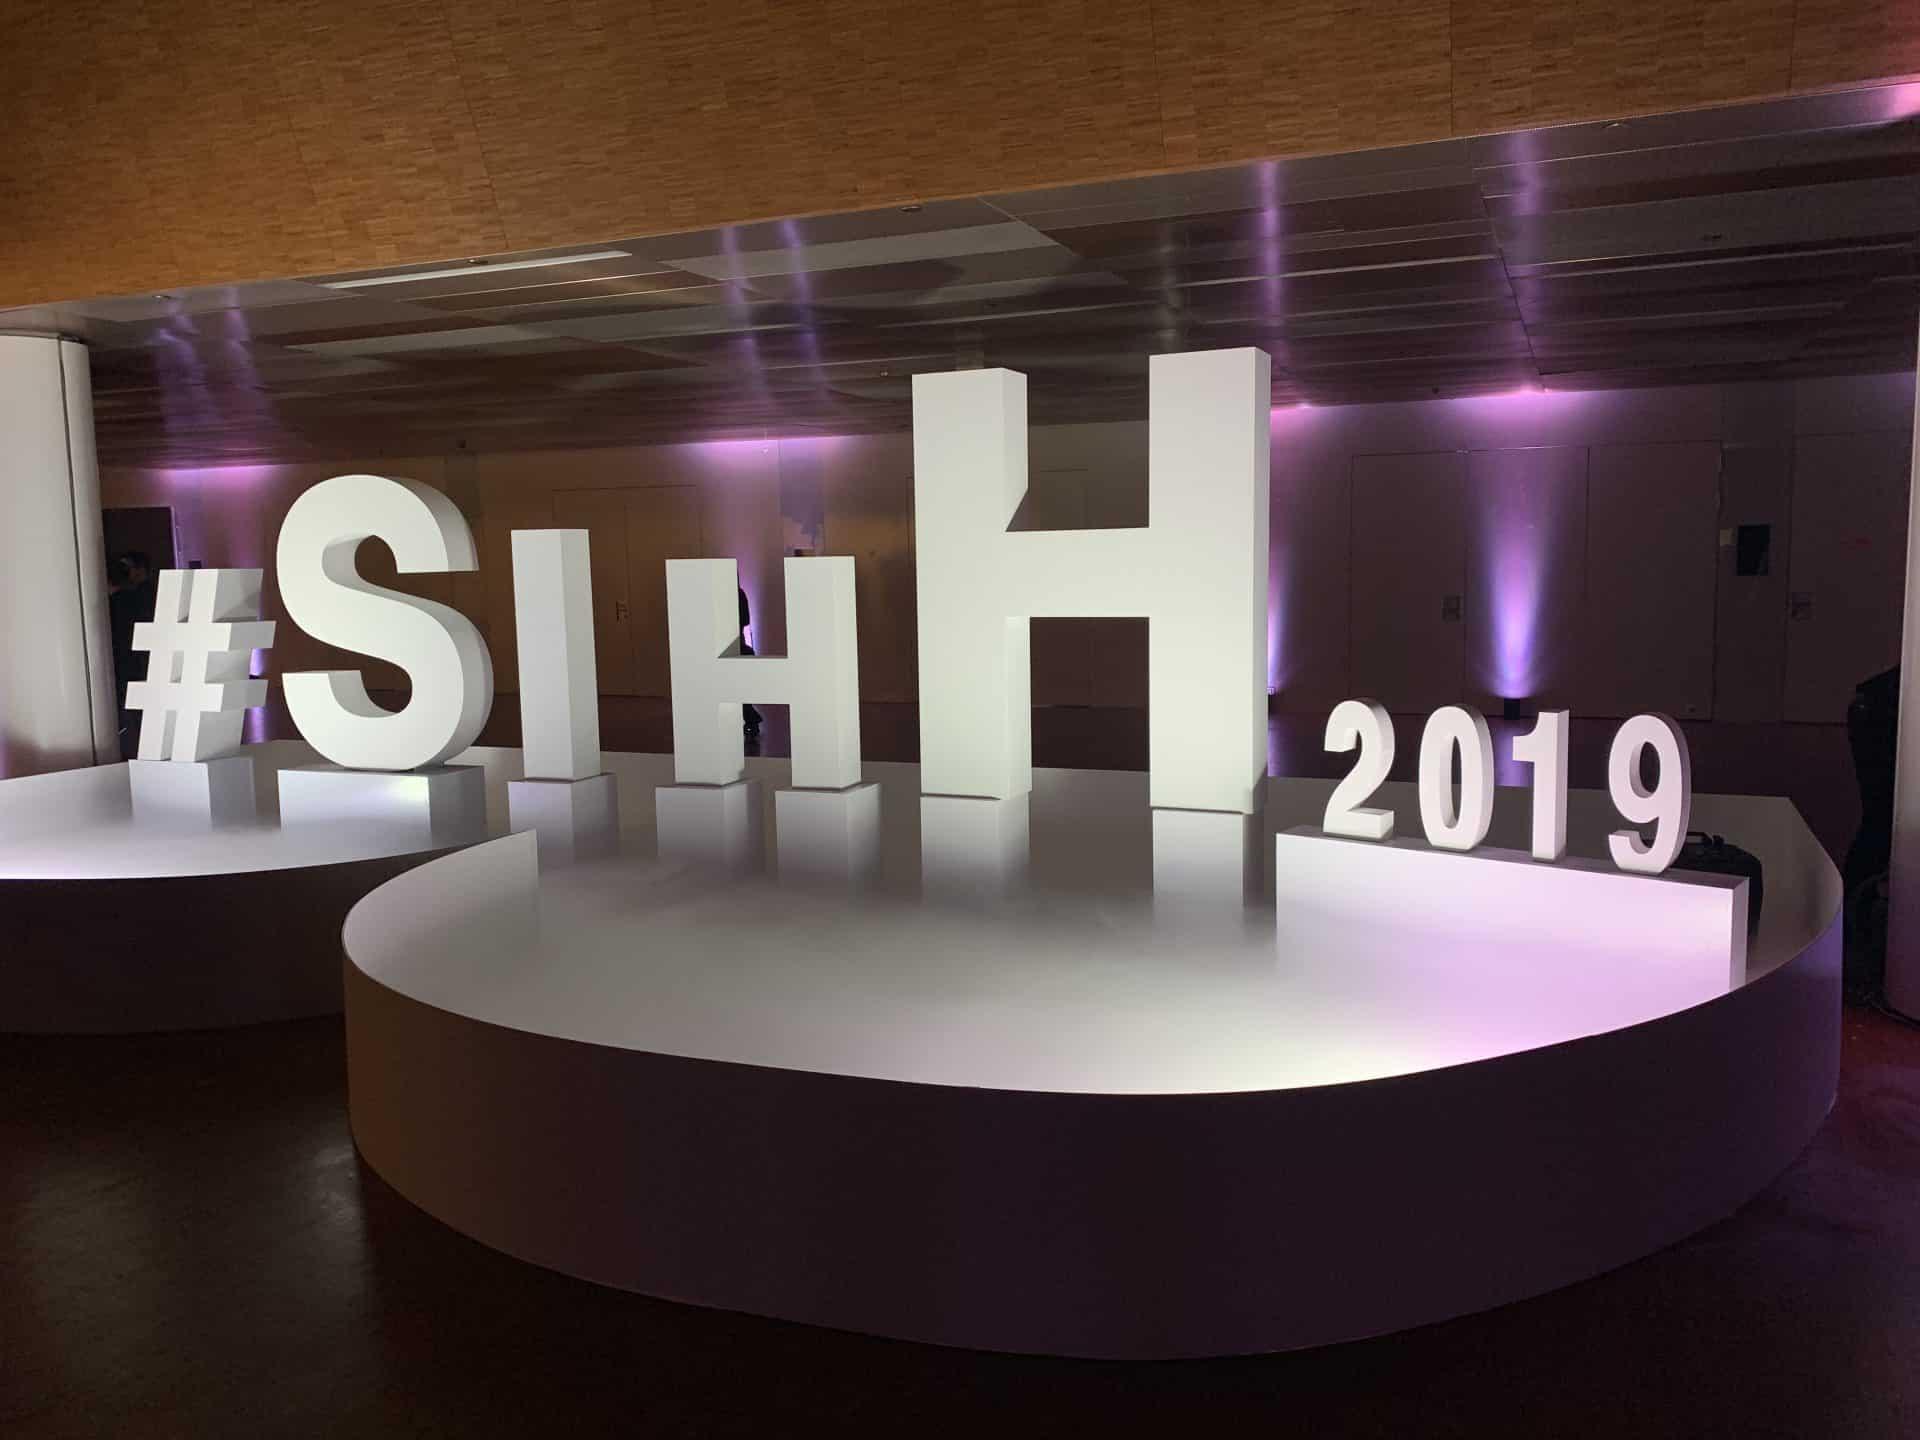 SIHH 2019 der Genfer Uhrensalon 2020 fällt wegen des Corina Virus aus Foto C Gisbert Brunner